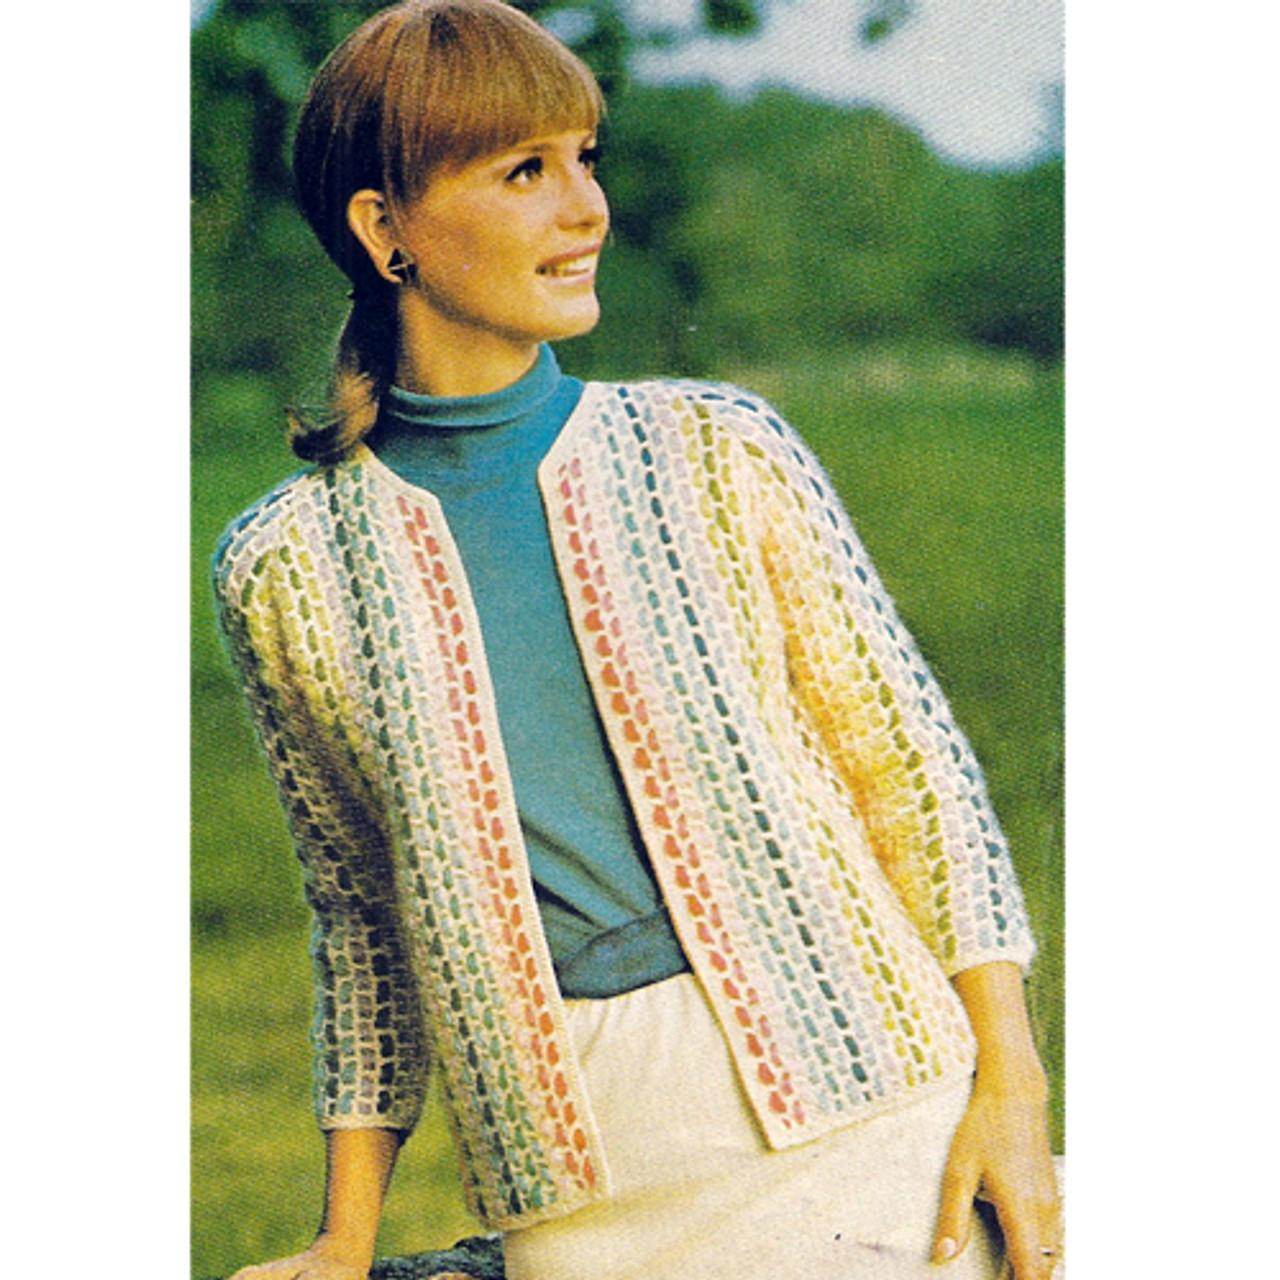 Crochet Open Front Jacket Pattern with Woven Stripes